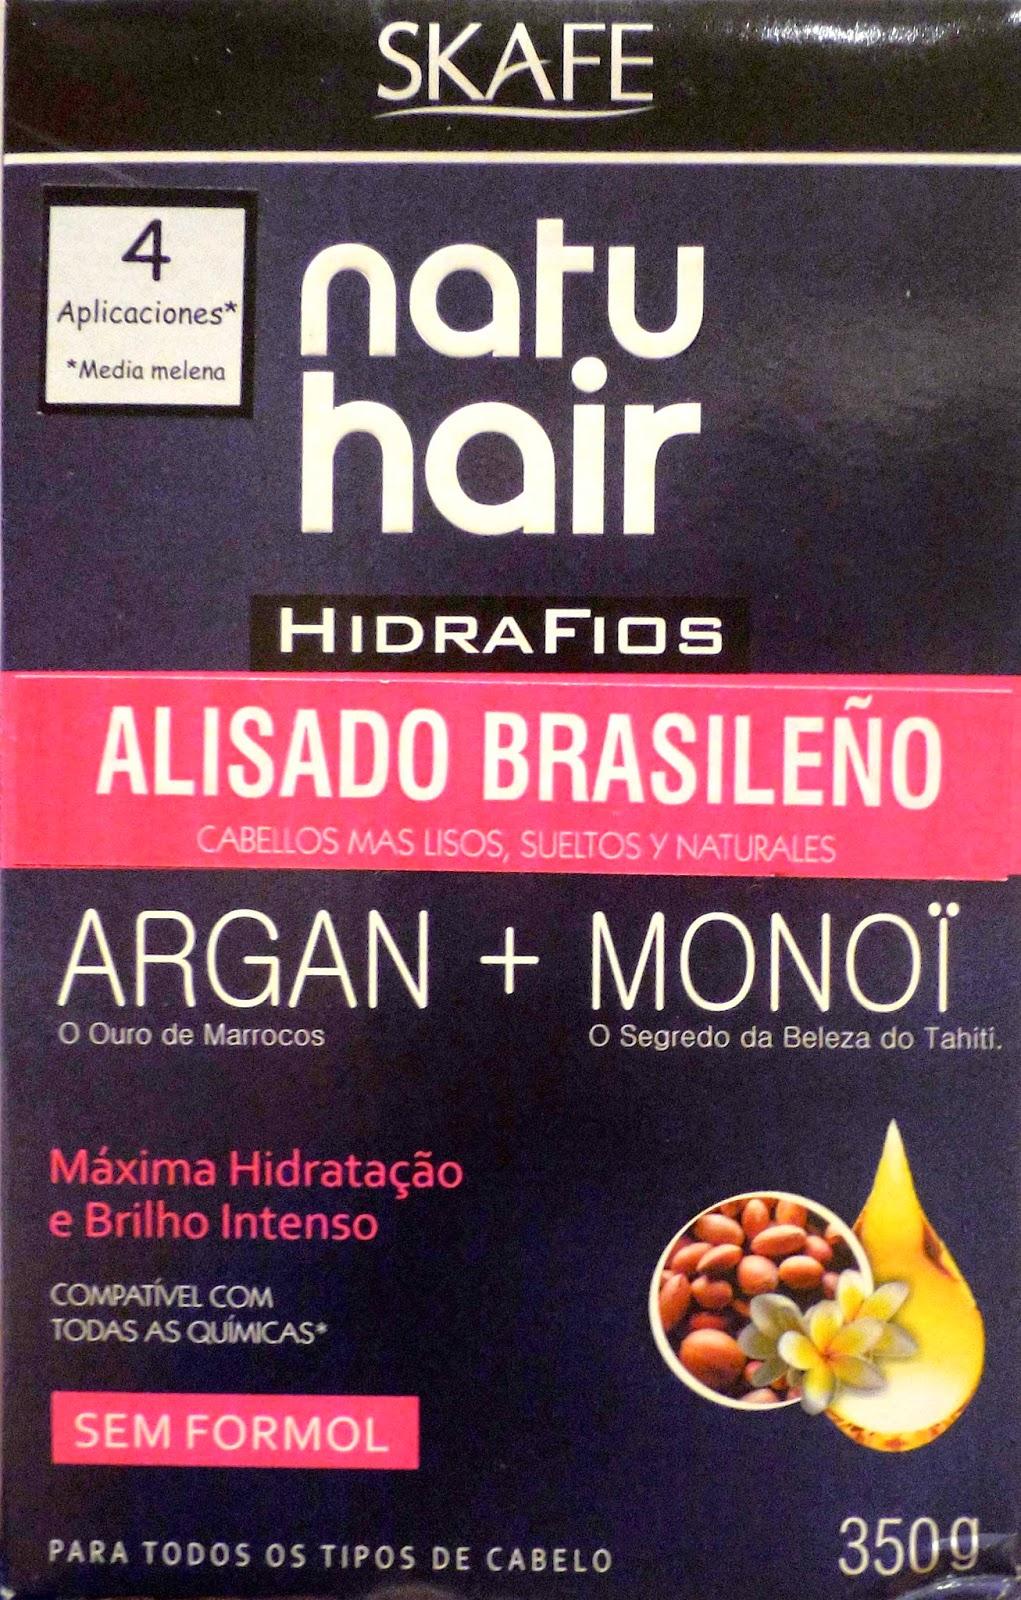 skafe natu hair hidra fios alisado brasileno